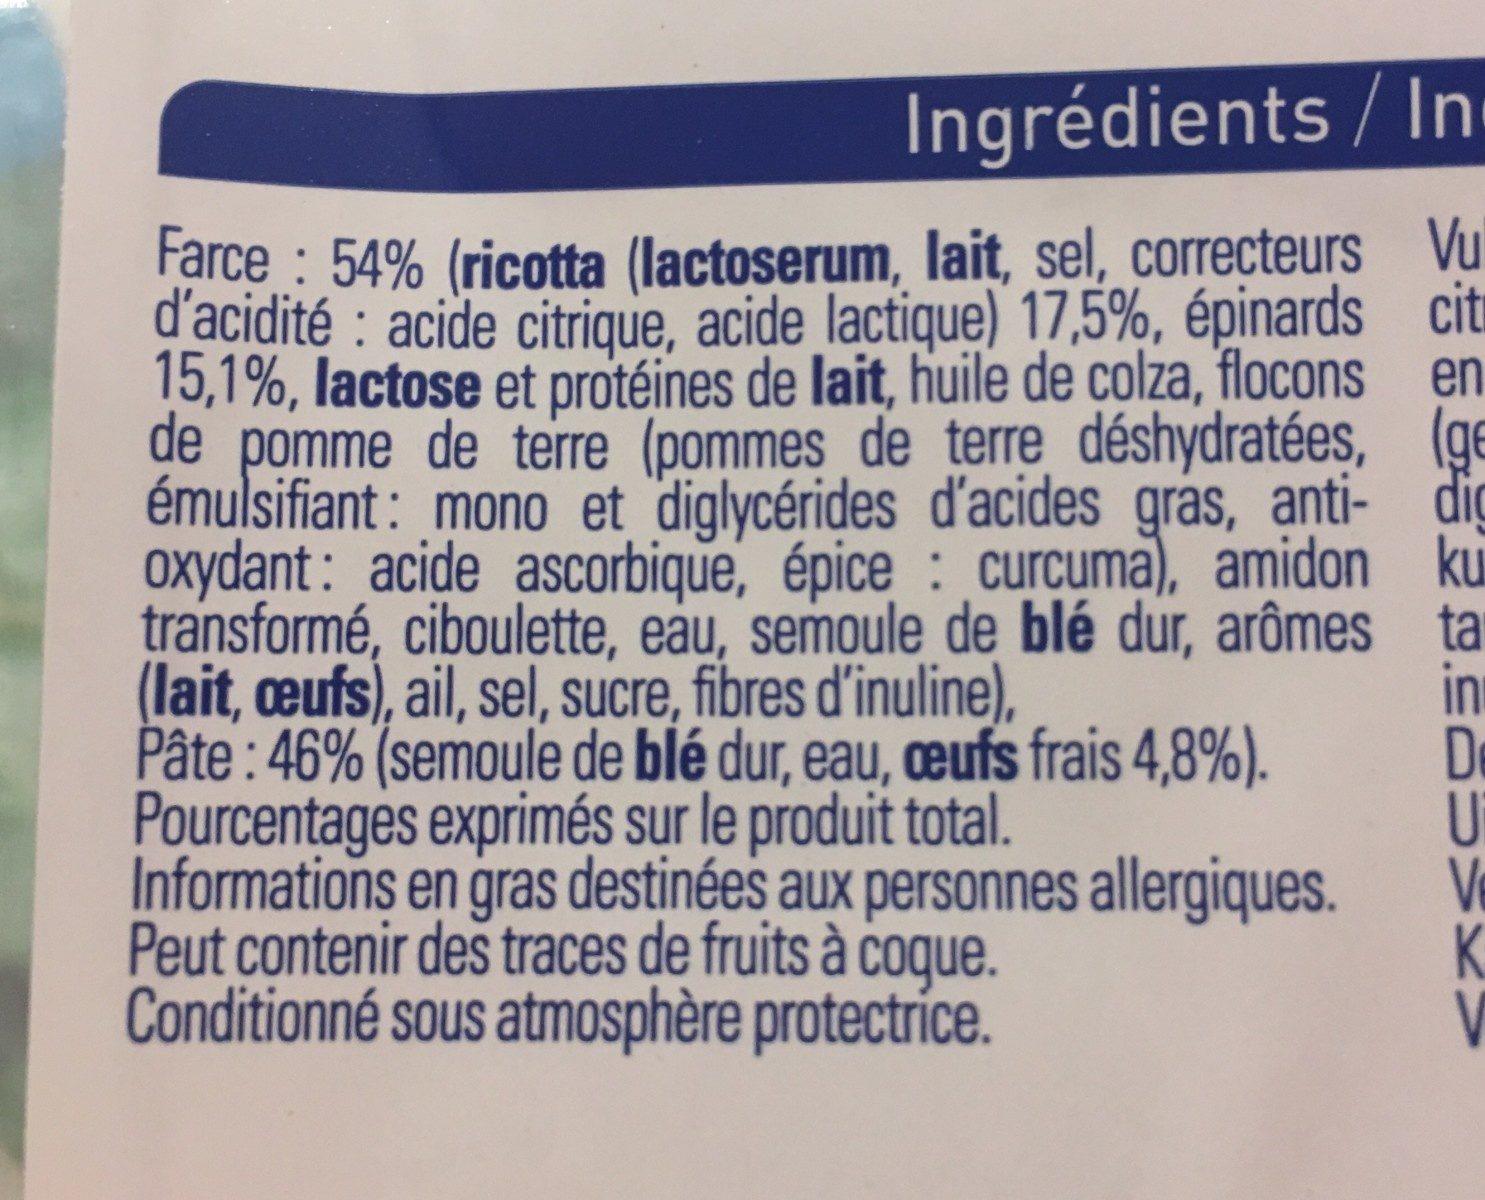 Demi lune - Ricottar Épinardtfrv grf - Ingredients